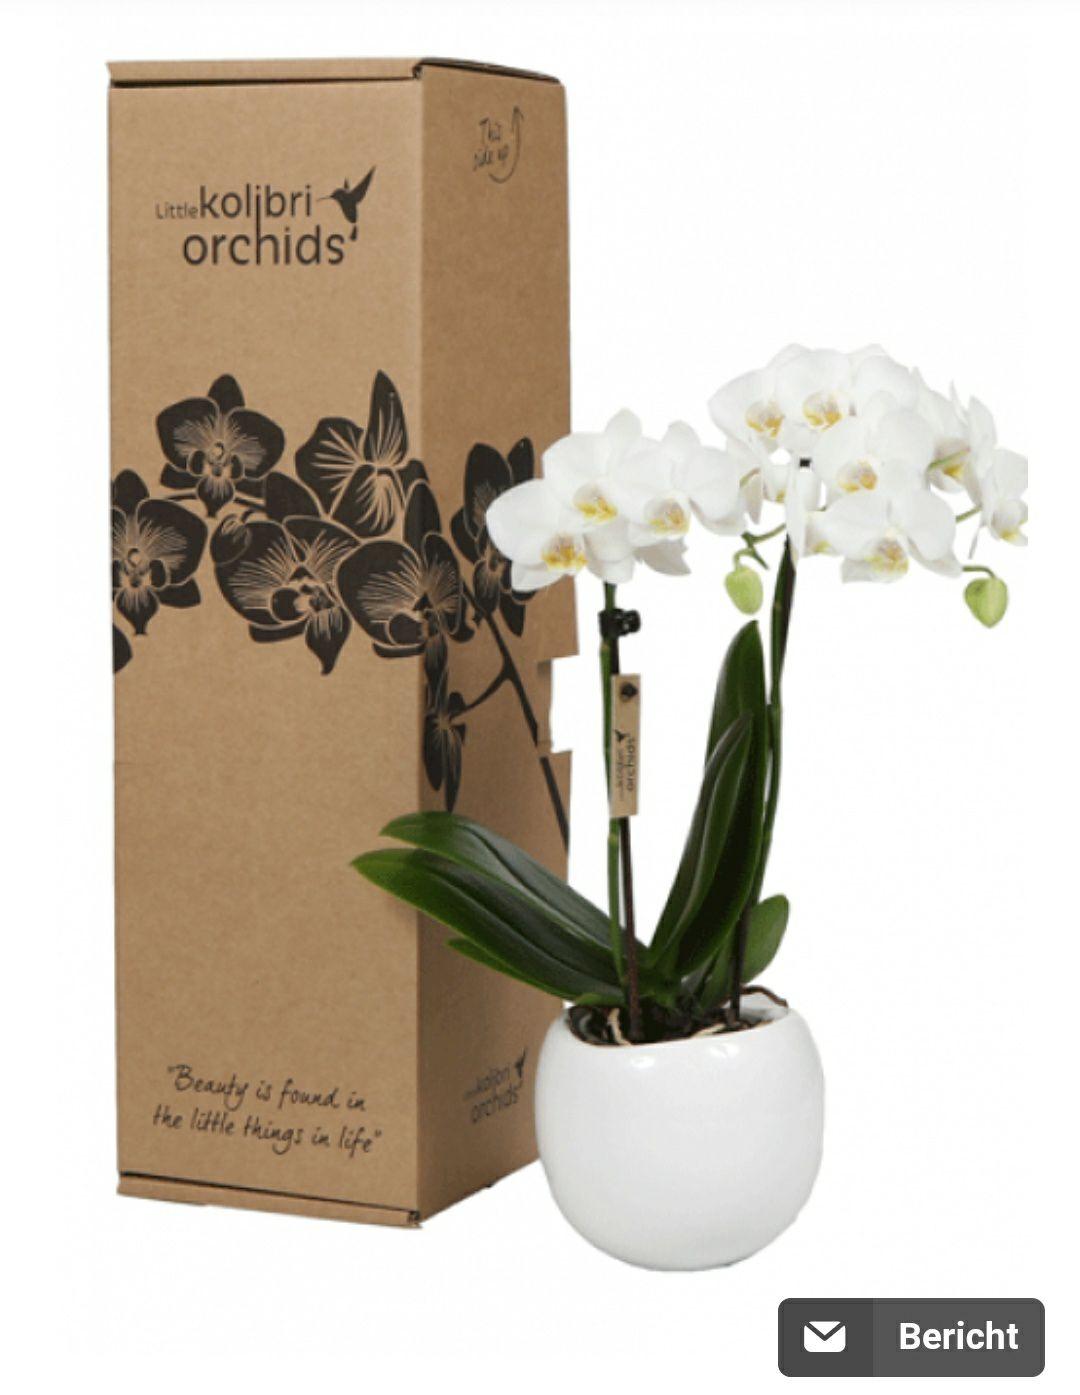 Mini orchideeën met 50% korting